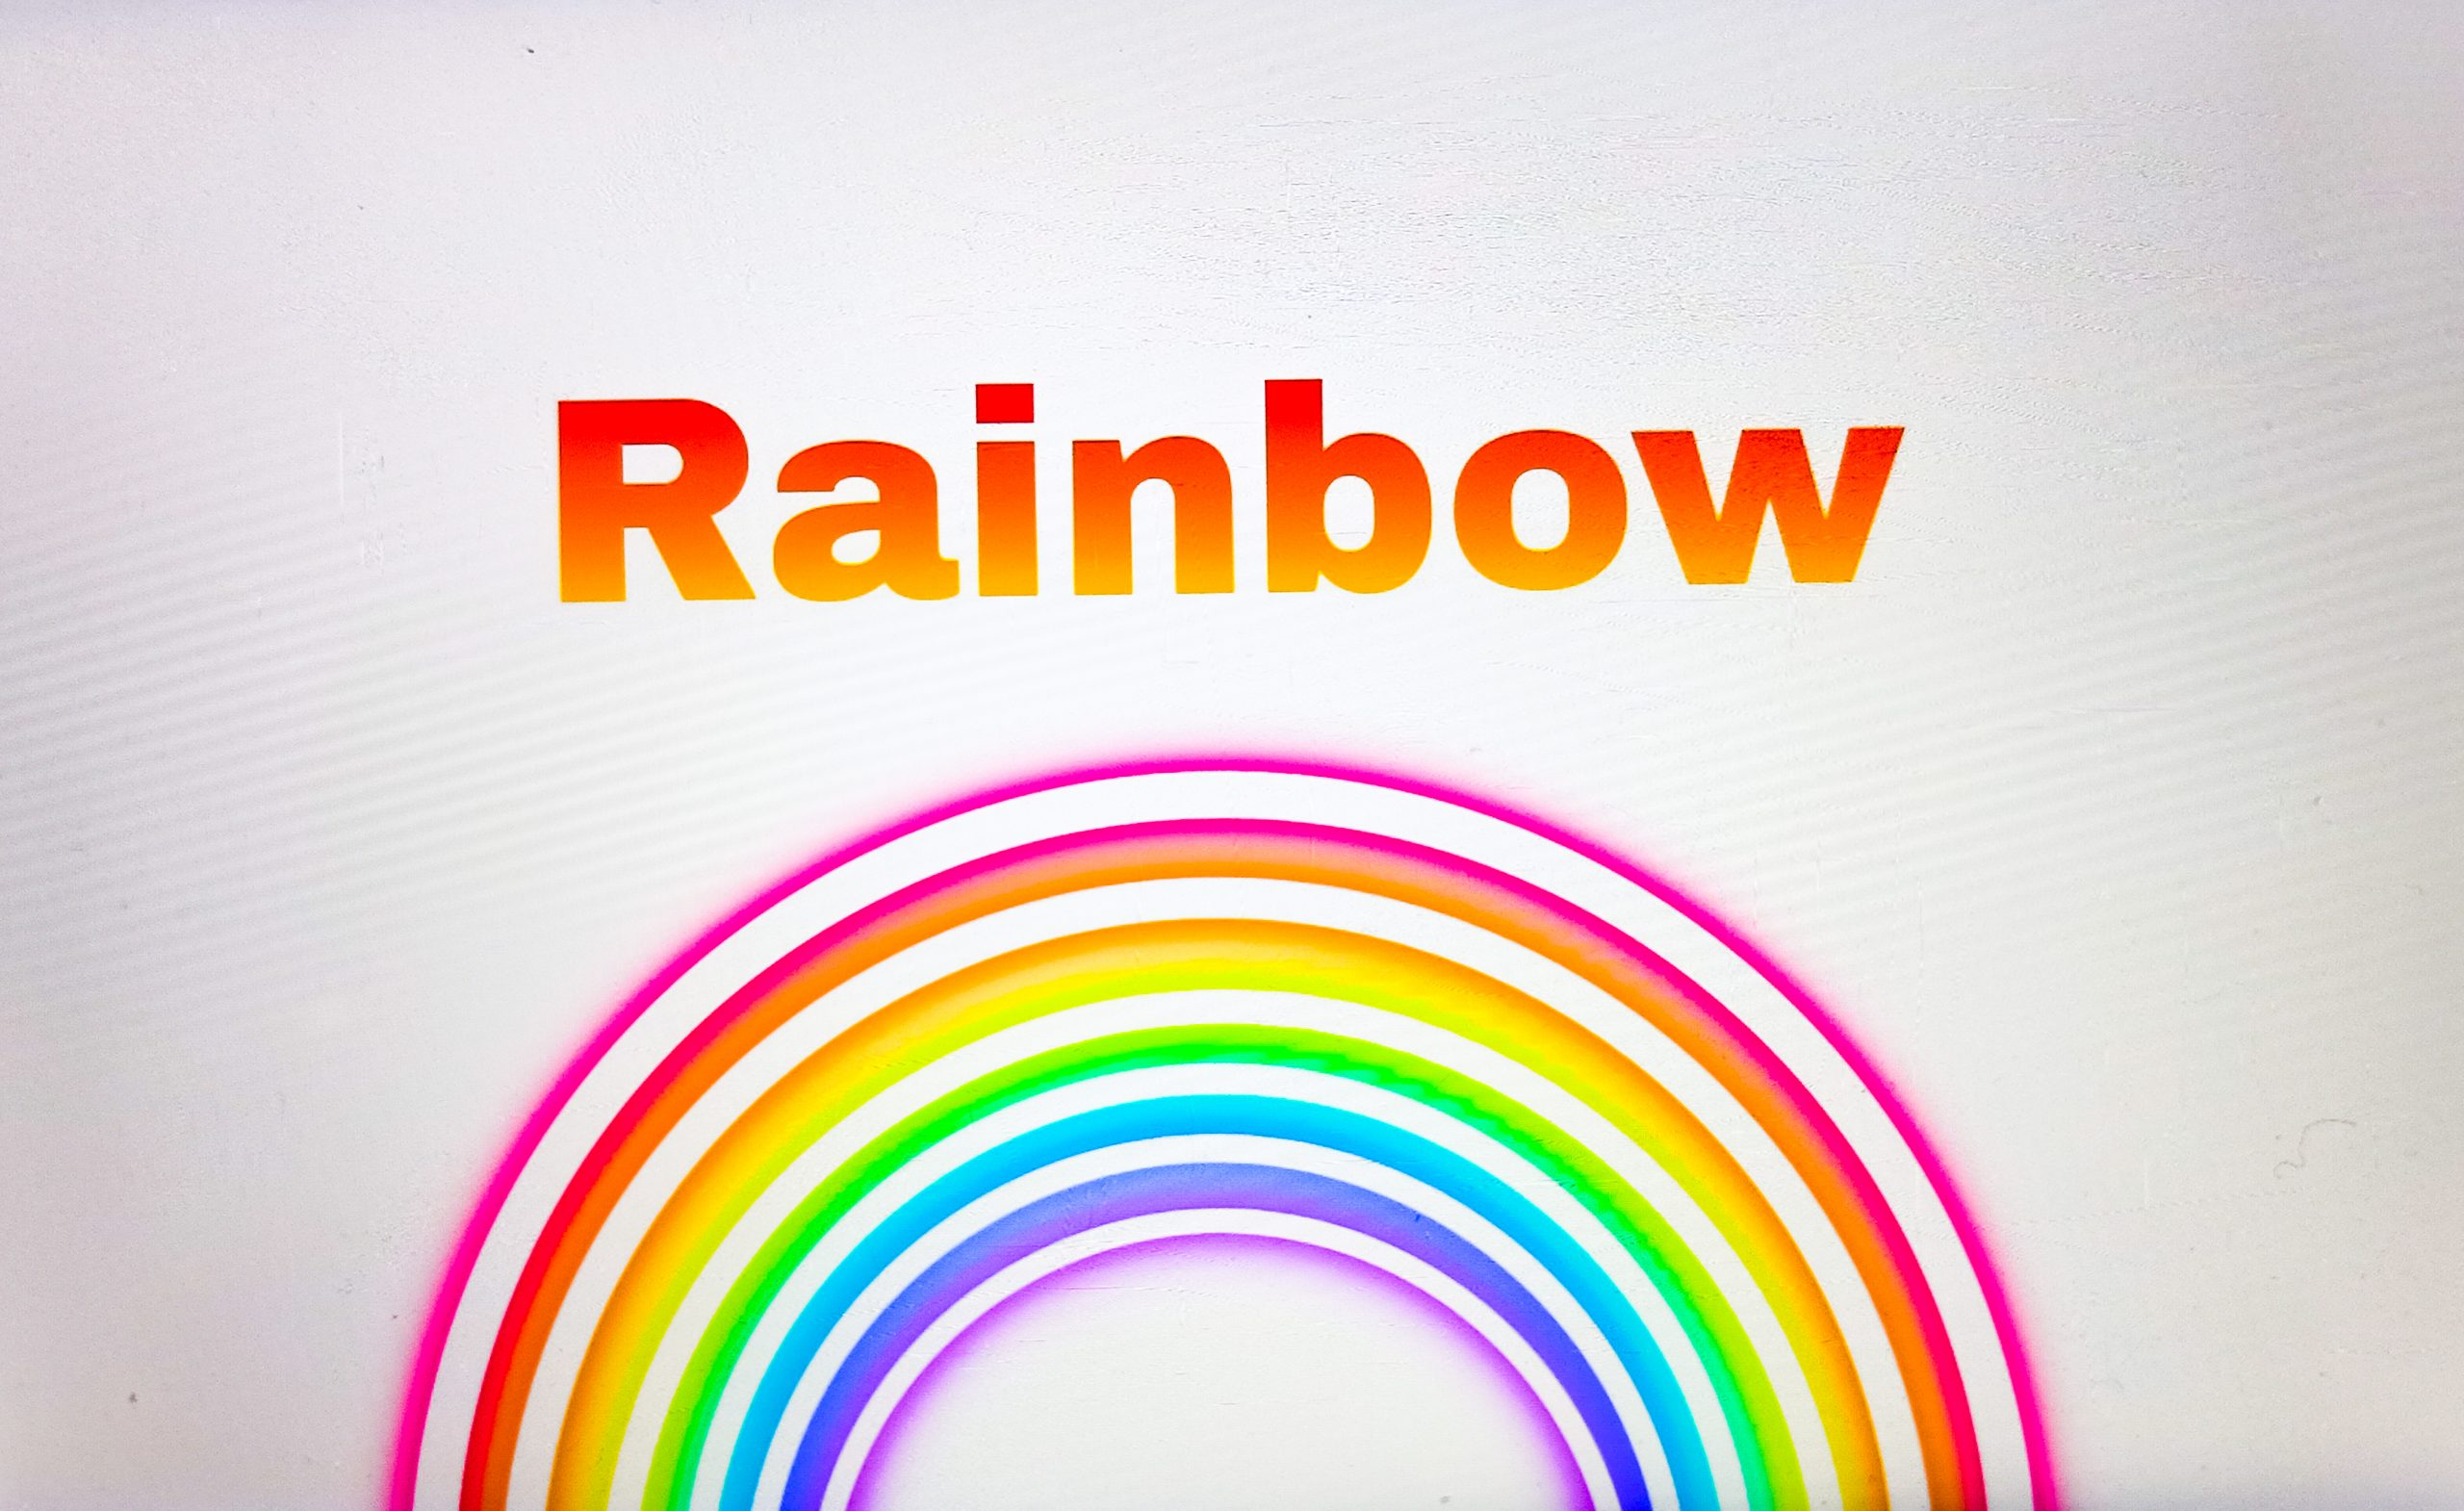 Rainbow illustrations